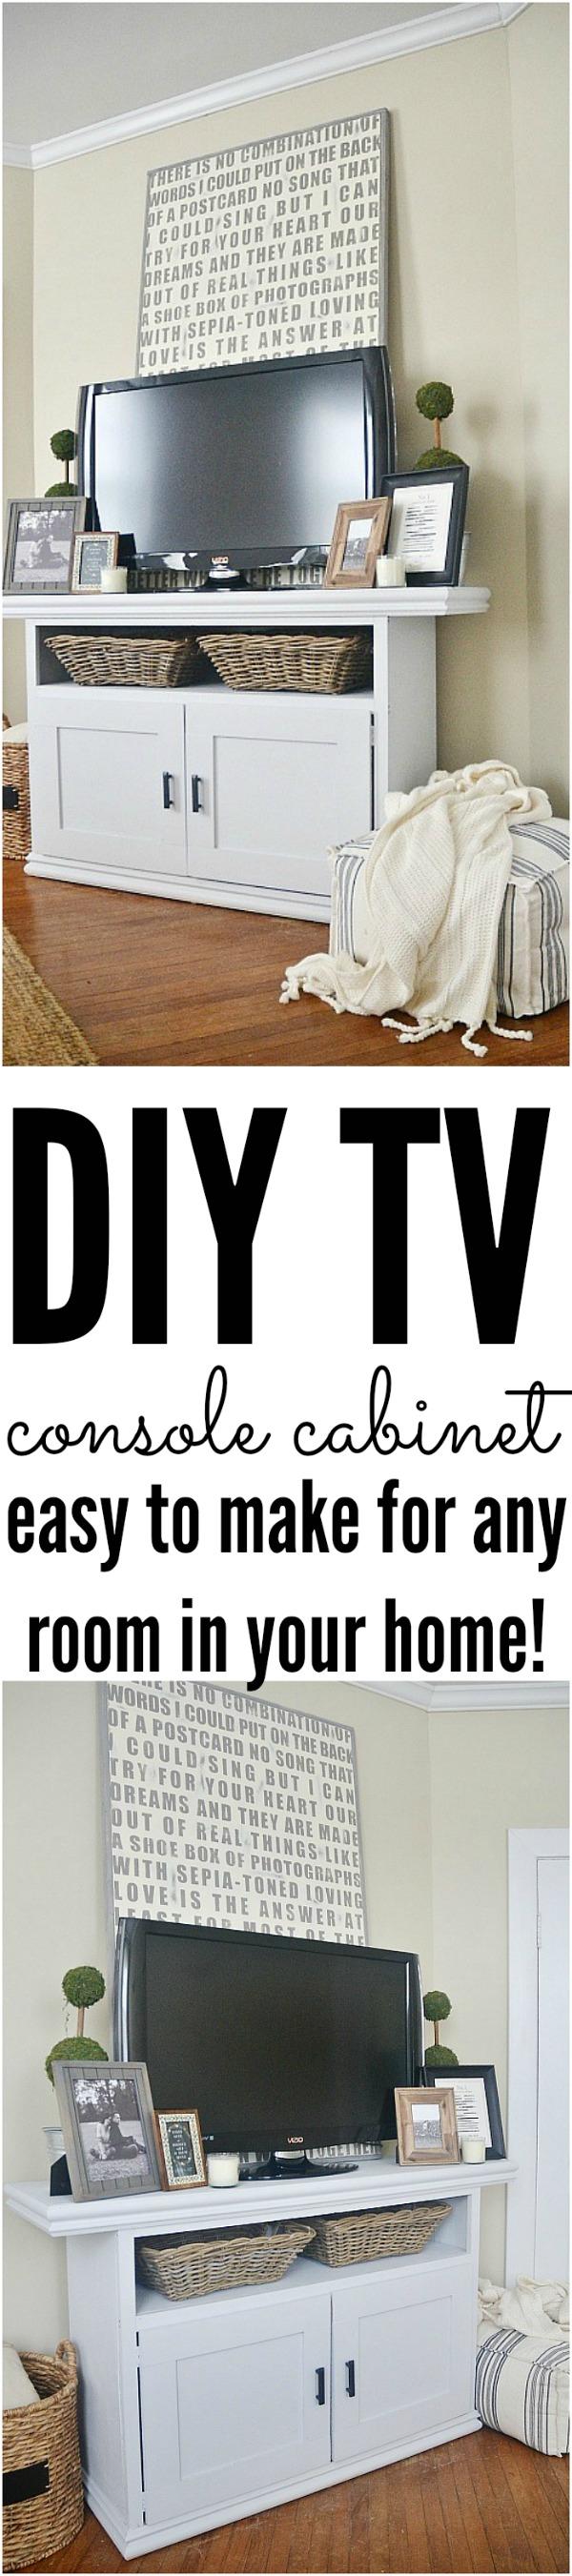 DIY TV Console Cabinet - lizmarieblog.com